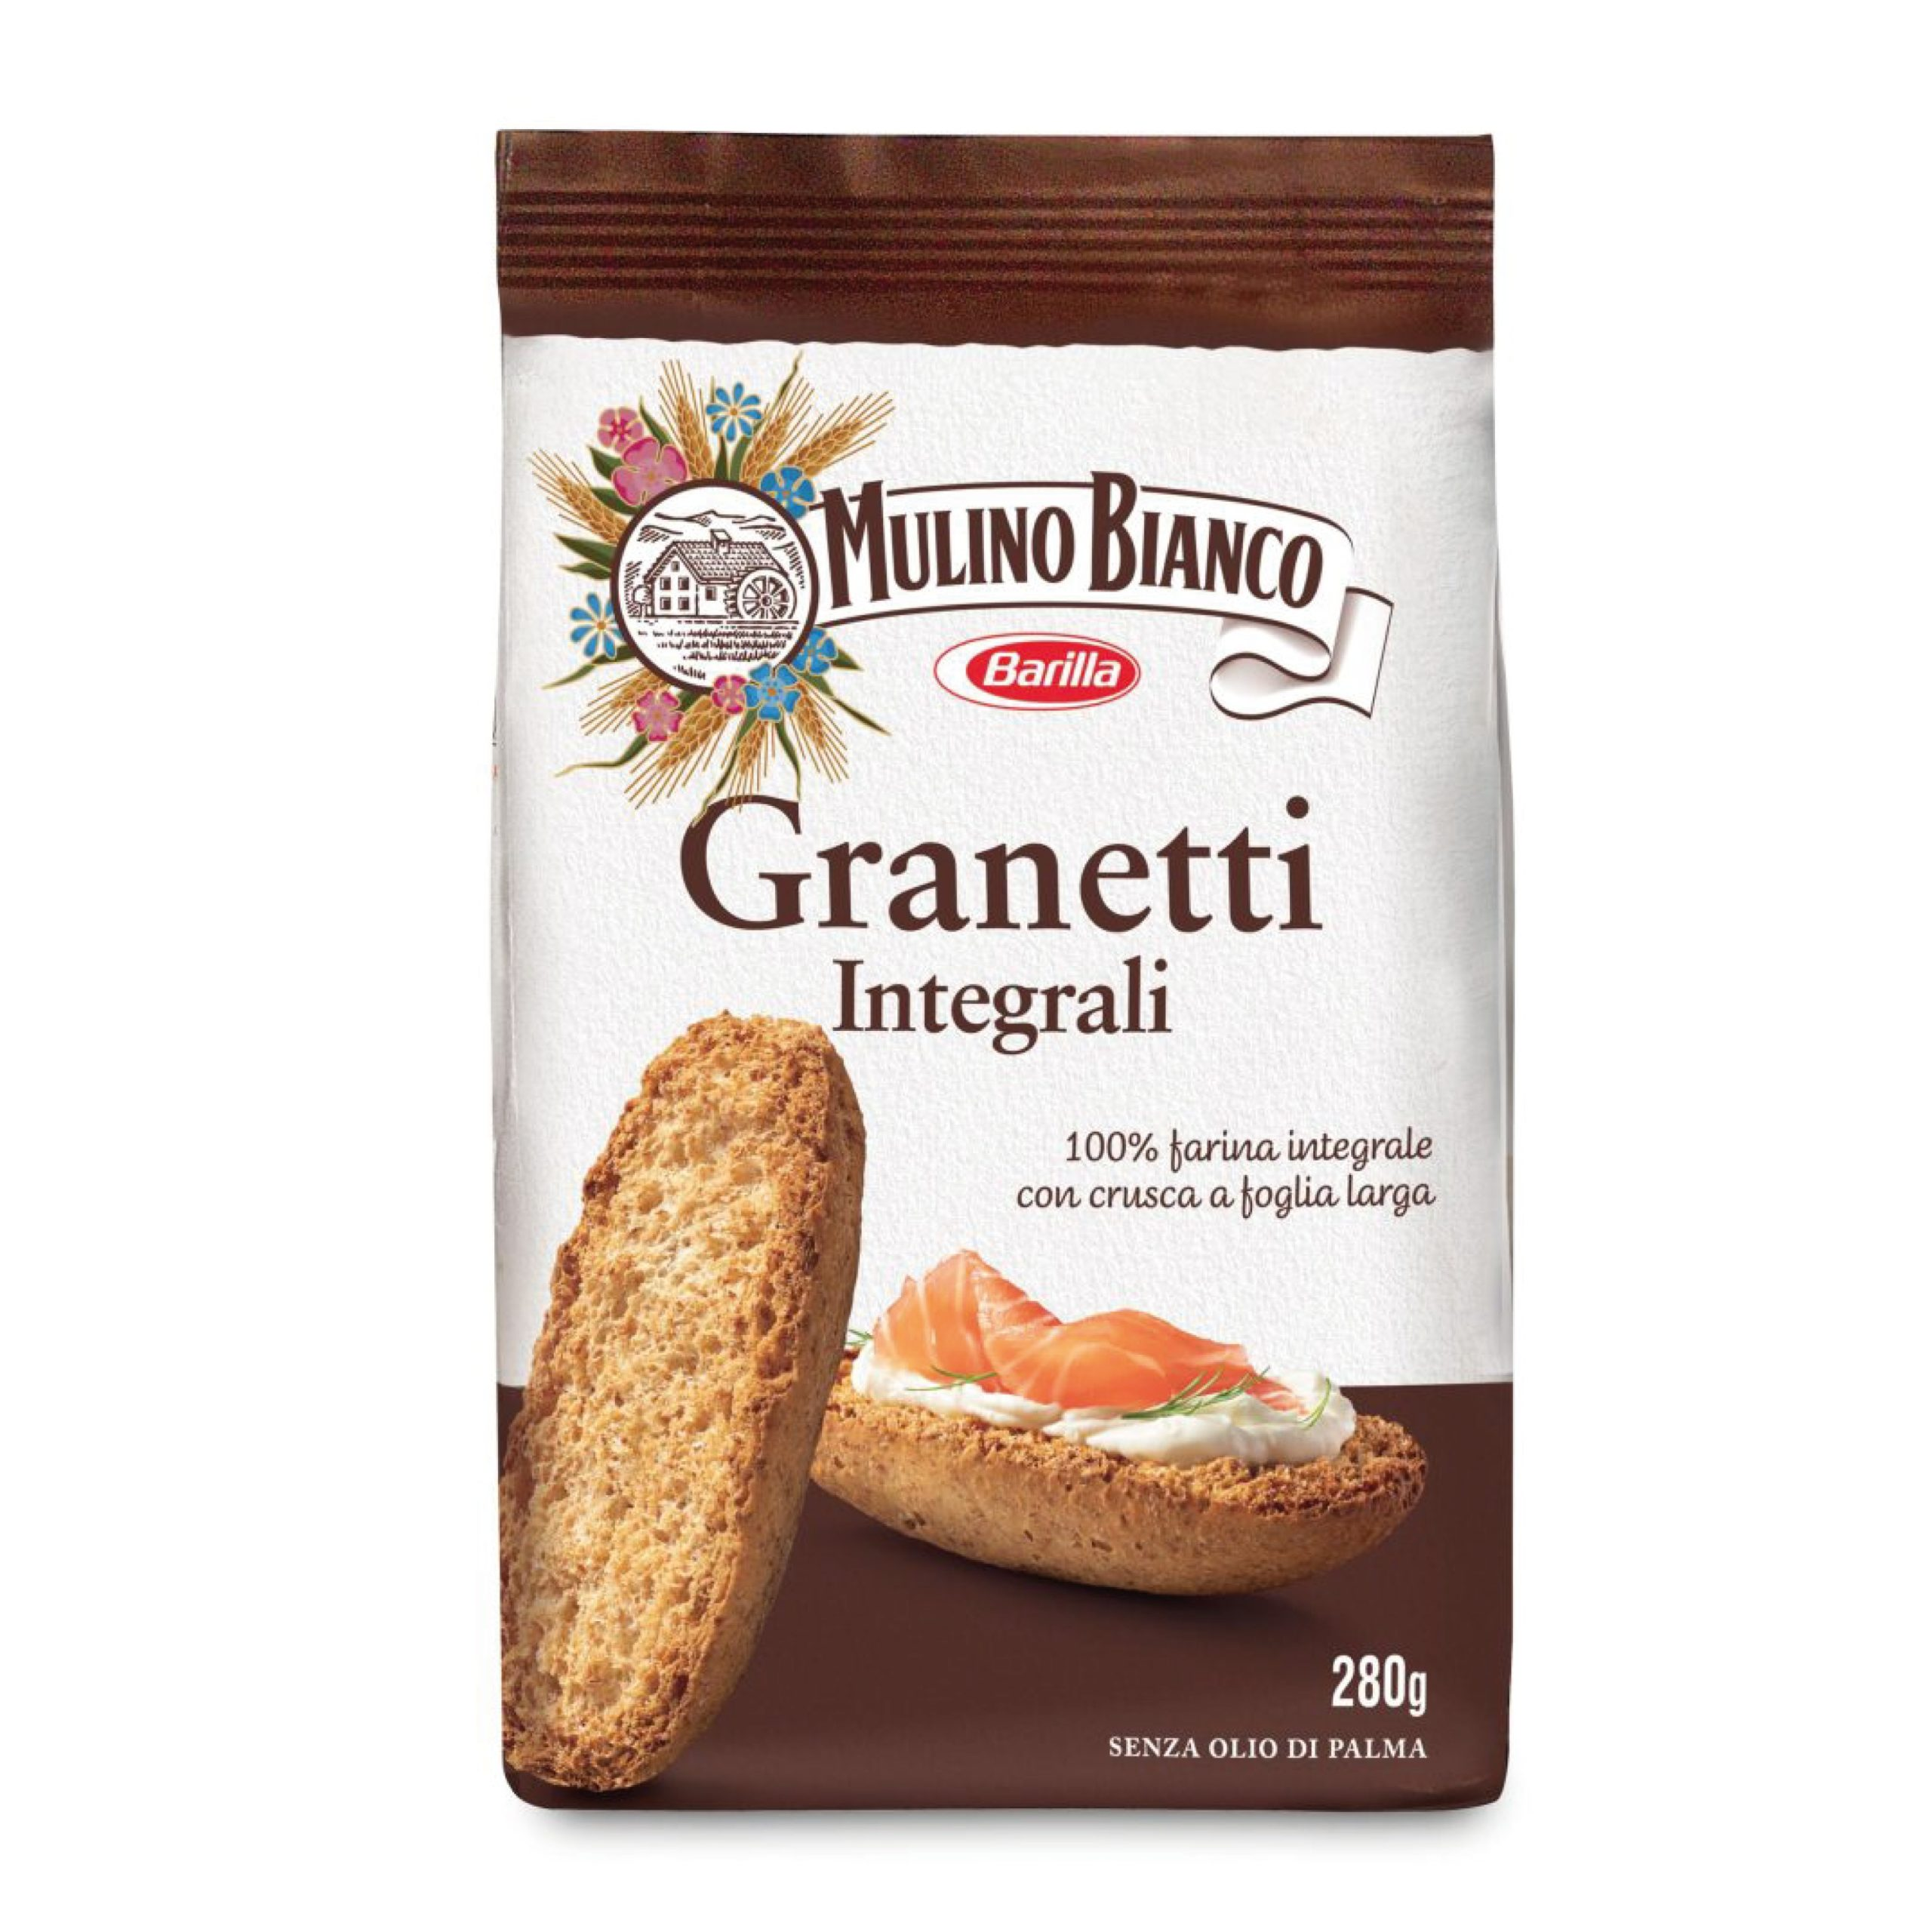 Mulino Bianco �C Wholewheat Granetti 280gr2560 x 2560 jpeg 440kB